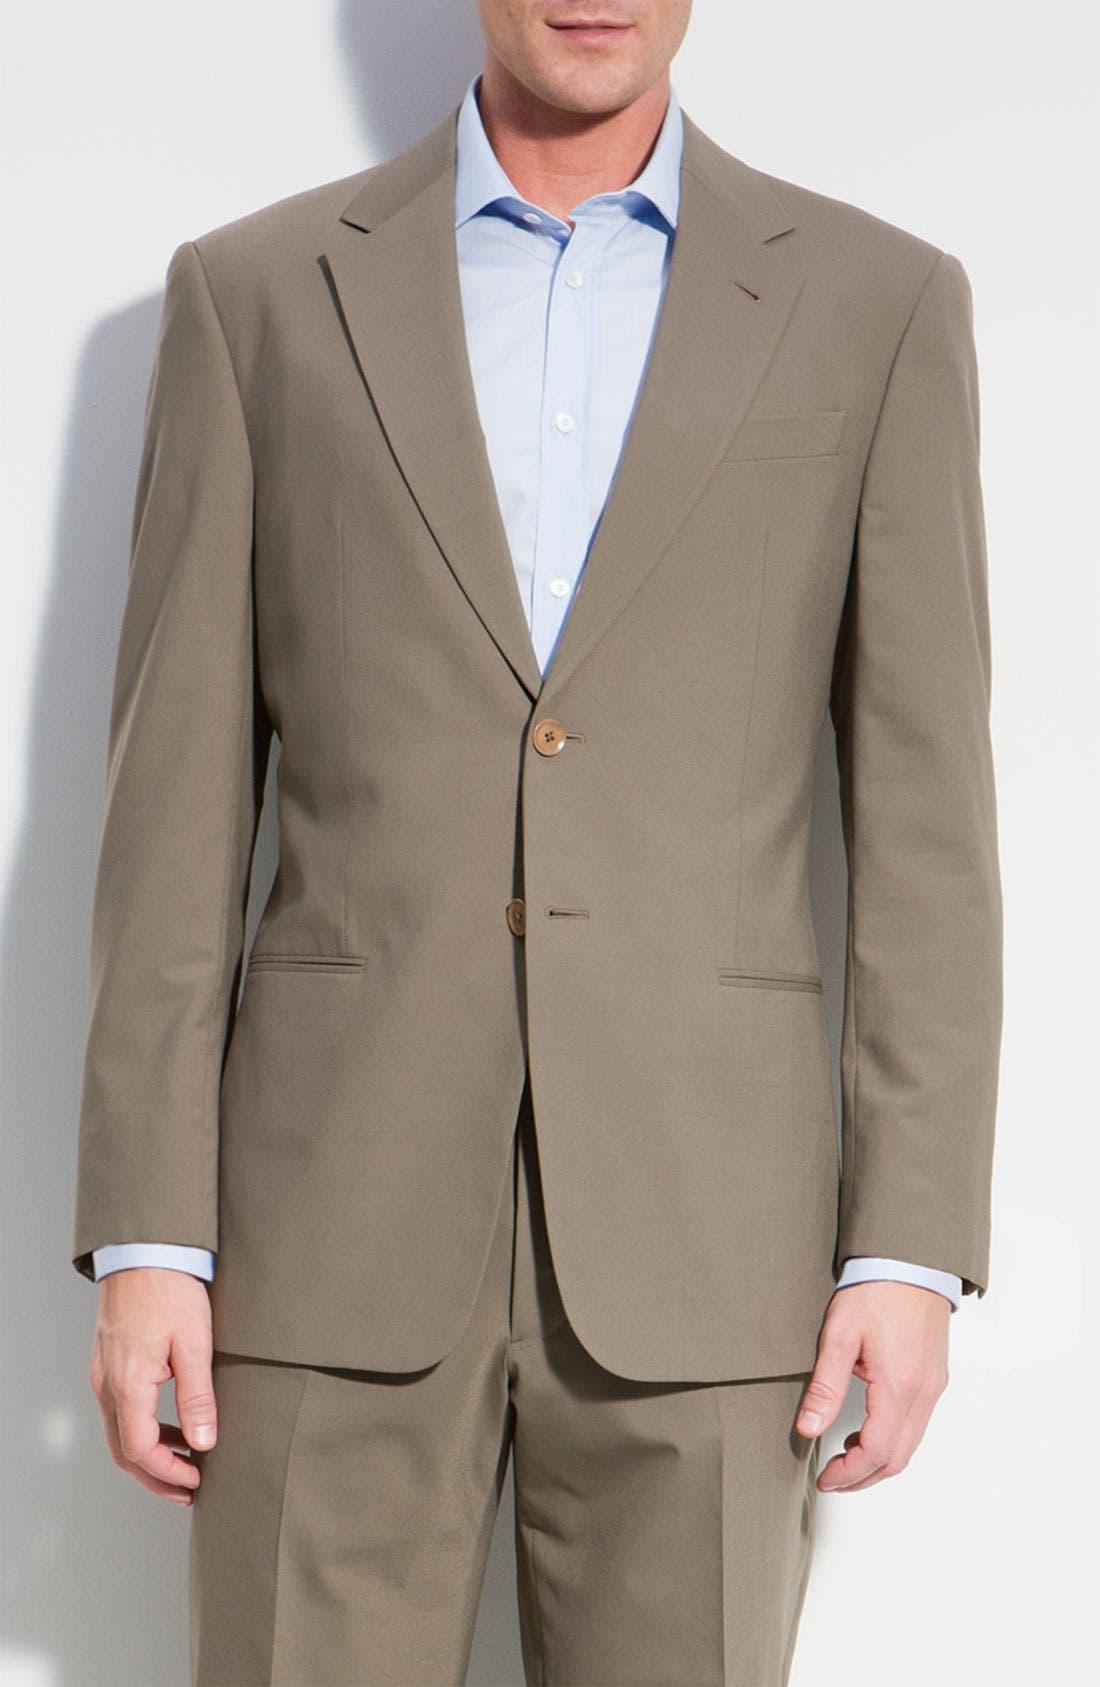 Main Image - Armani Collezioni 'Executive' Wool Blend Suit